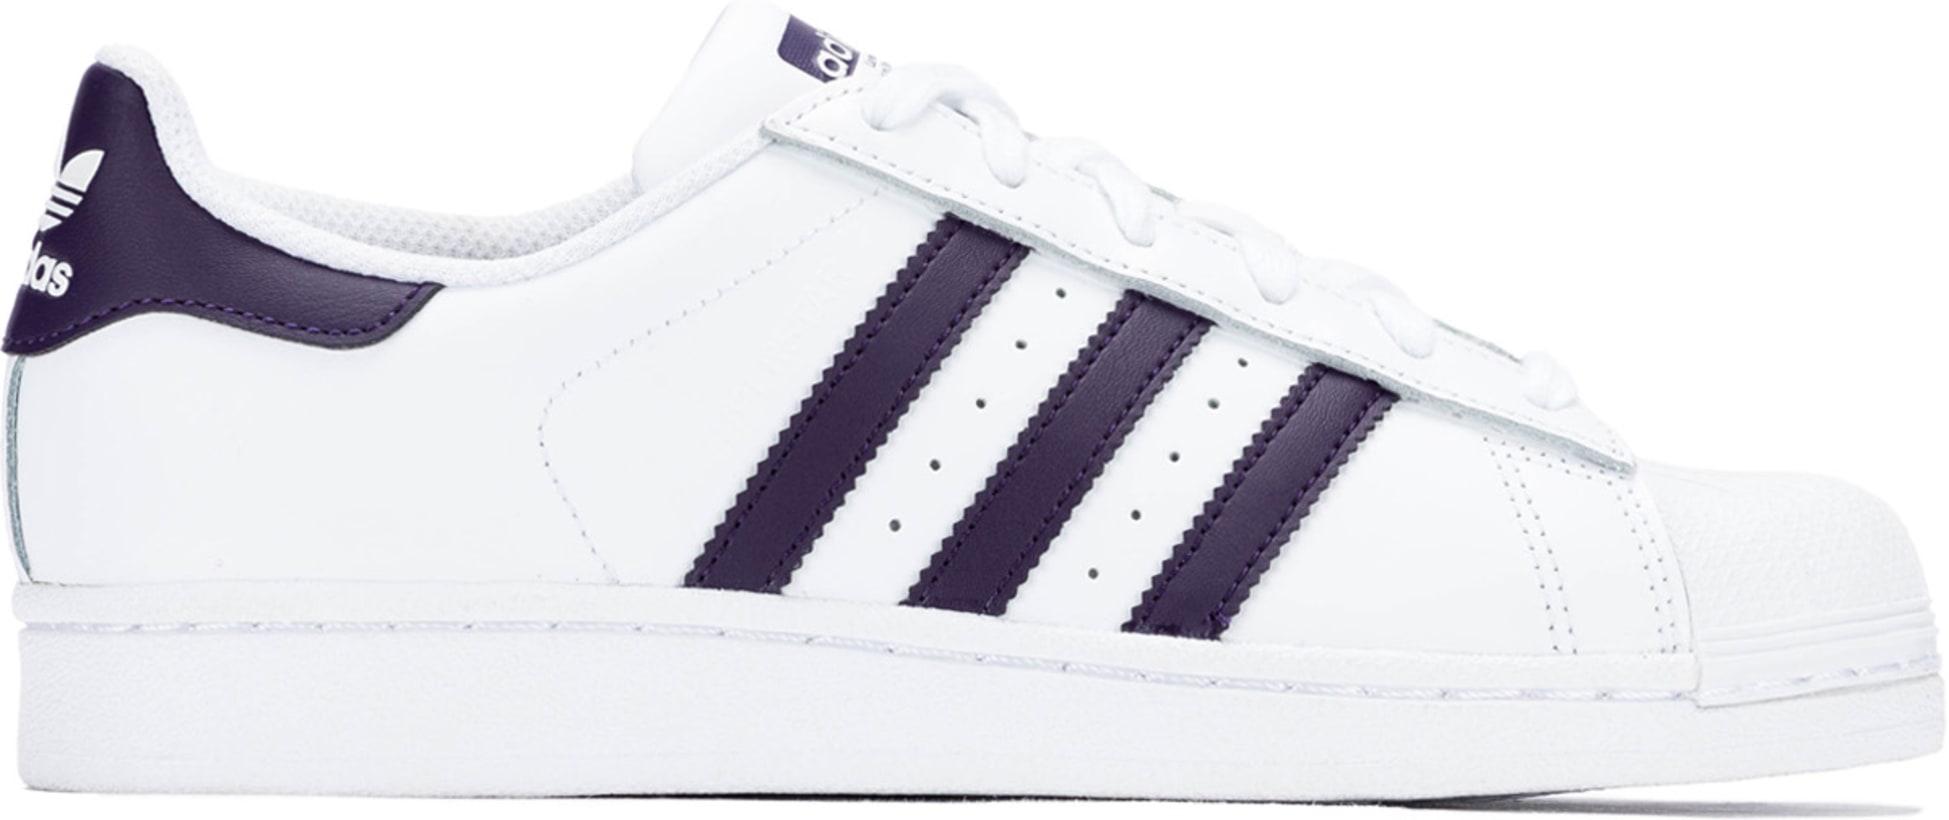 6d070c10615 adidas Originals  Superstar - Footwear White Legend Purple Core ...